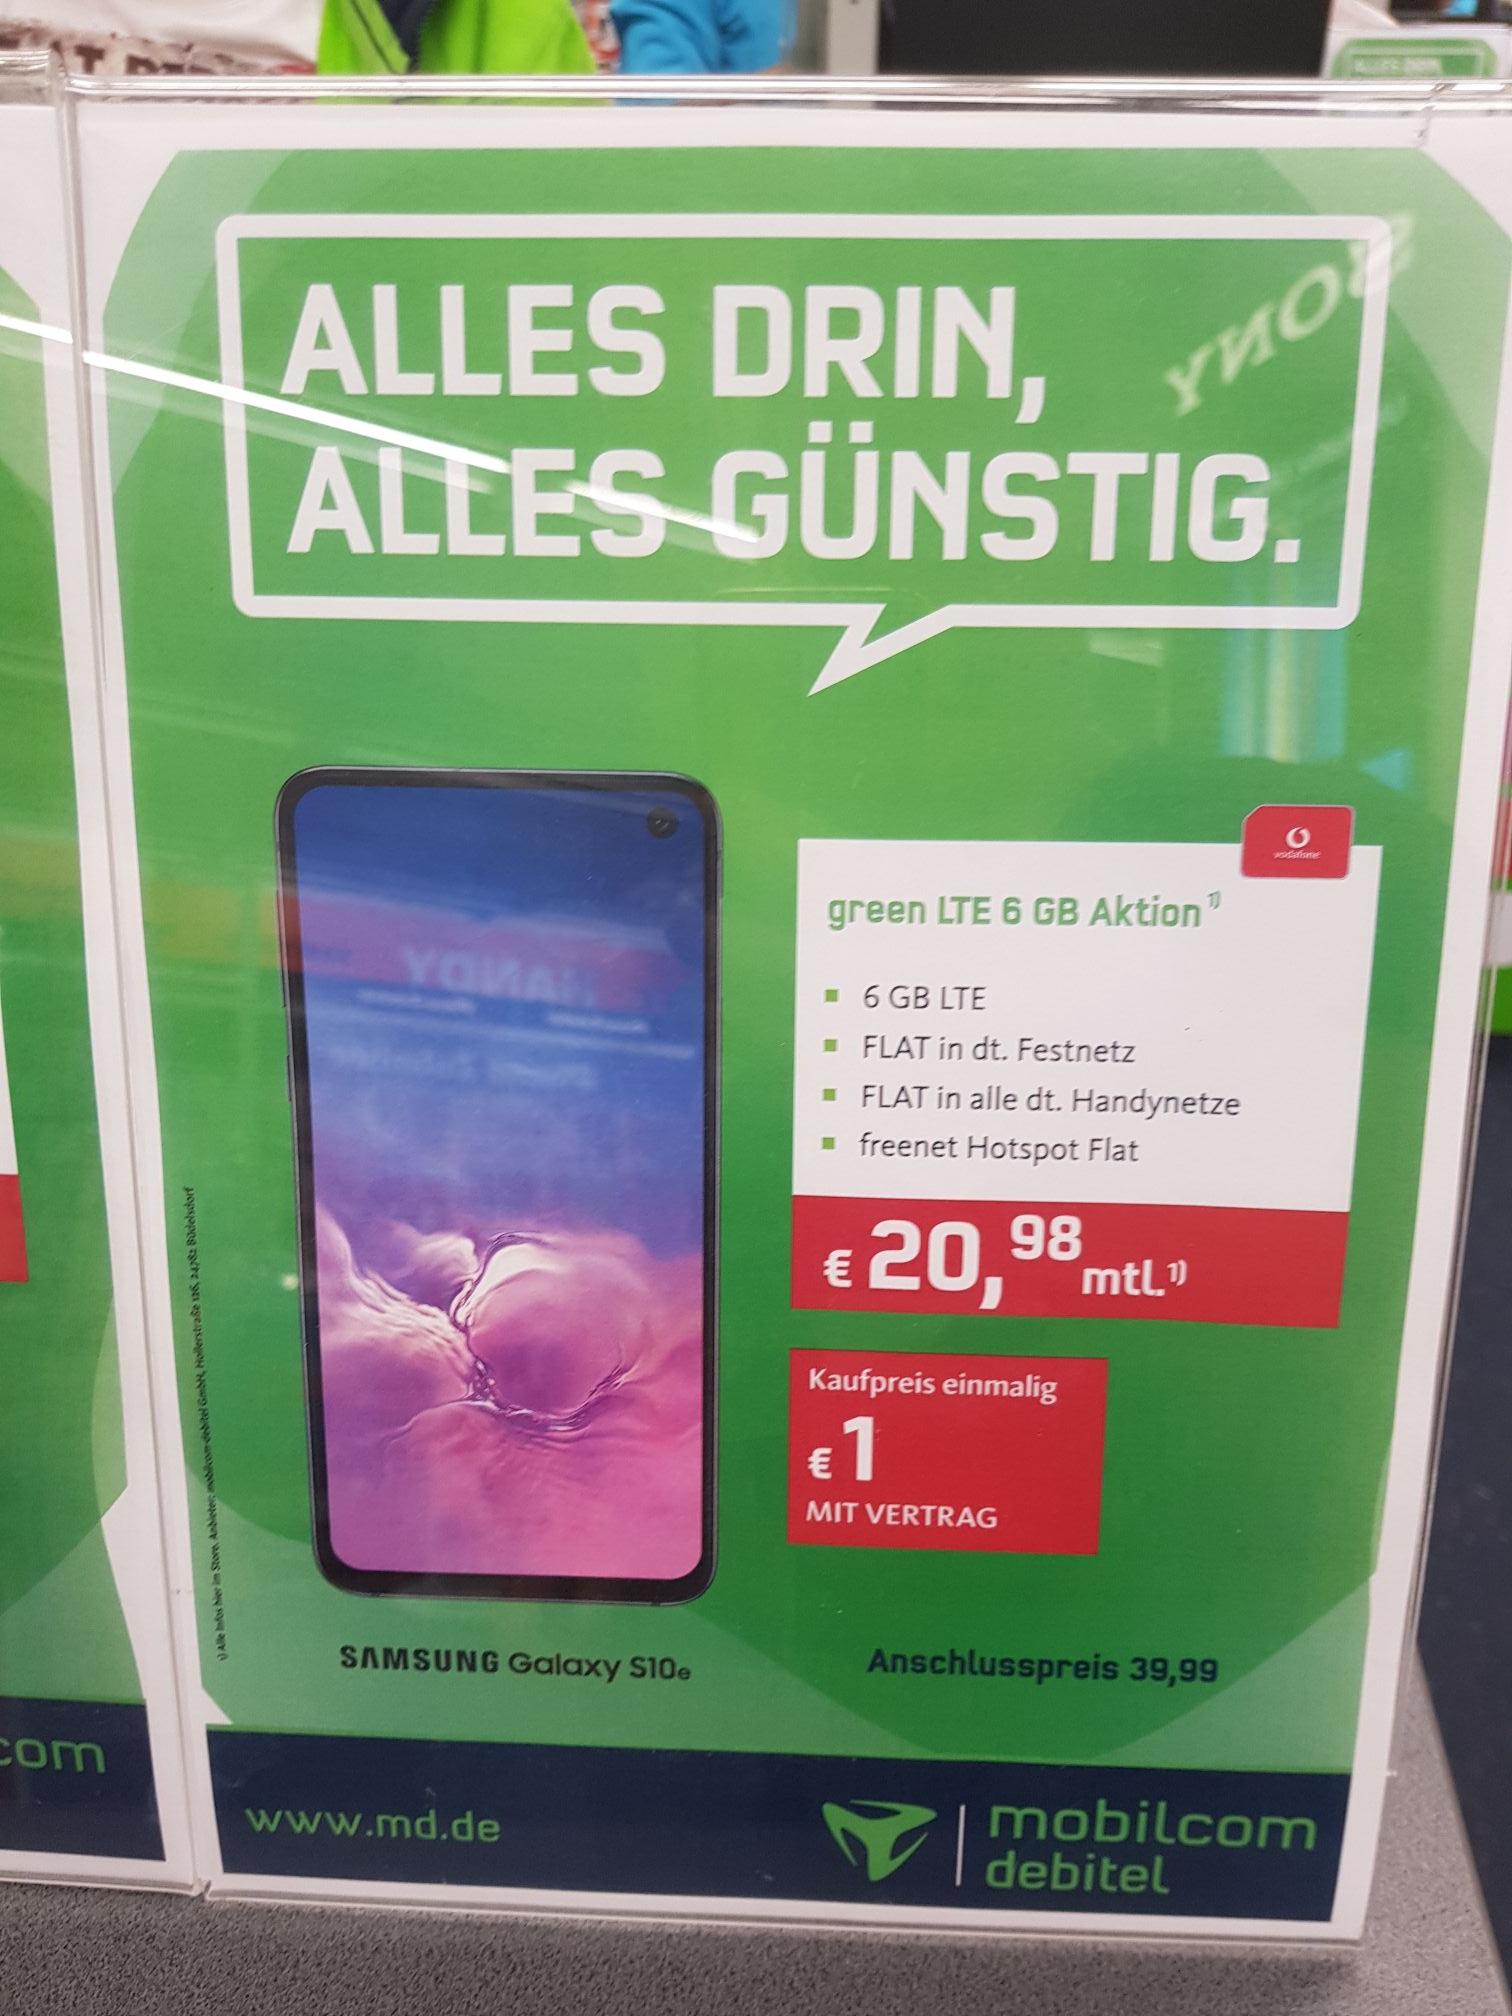 [LOKAL] Samsung Galaxy s10e (Vodafone) 1€ + 39.99€ AG und 20,98€ pro Monat für 6GB LTE Allnetflat